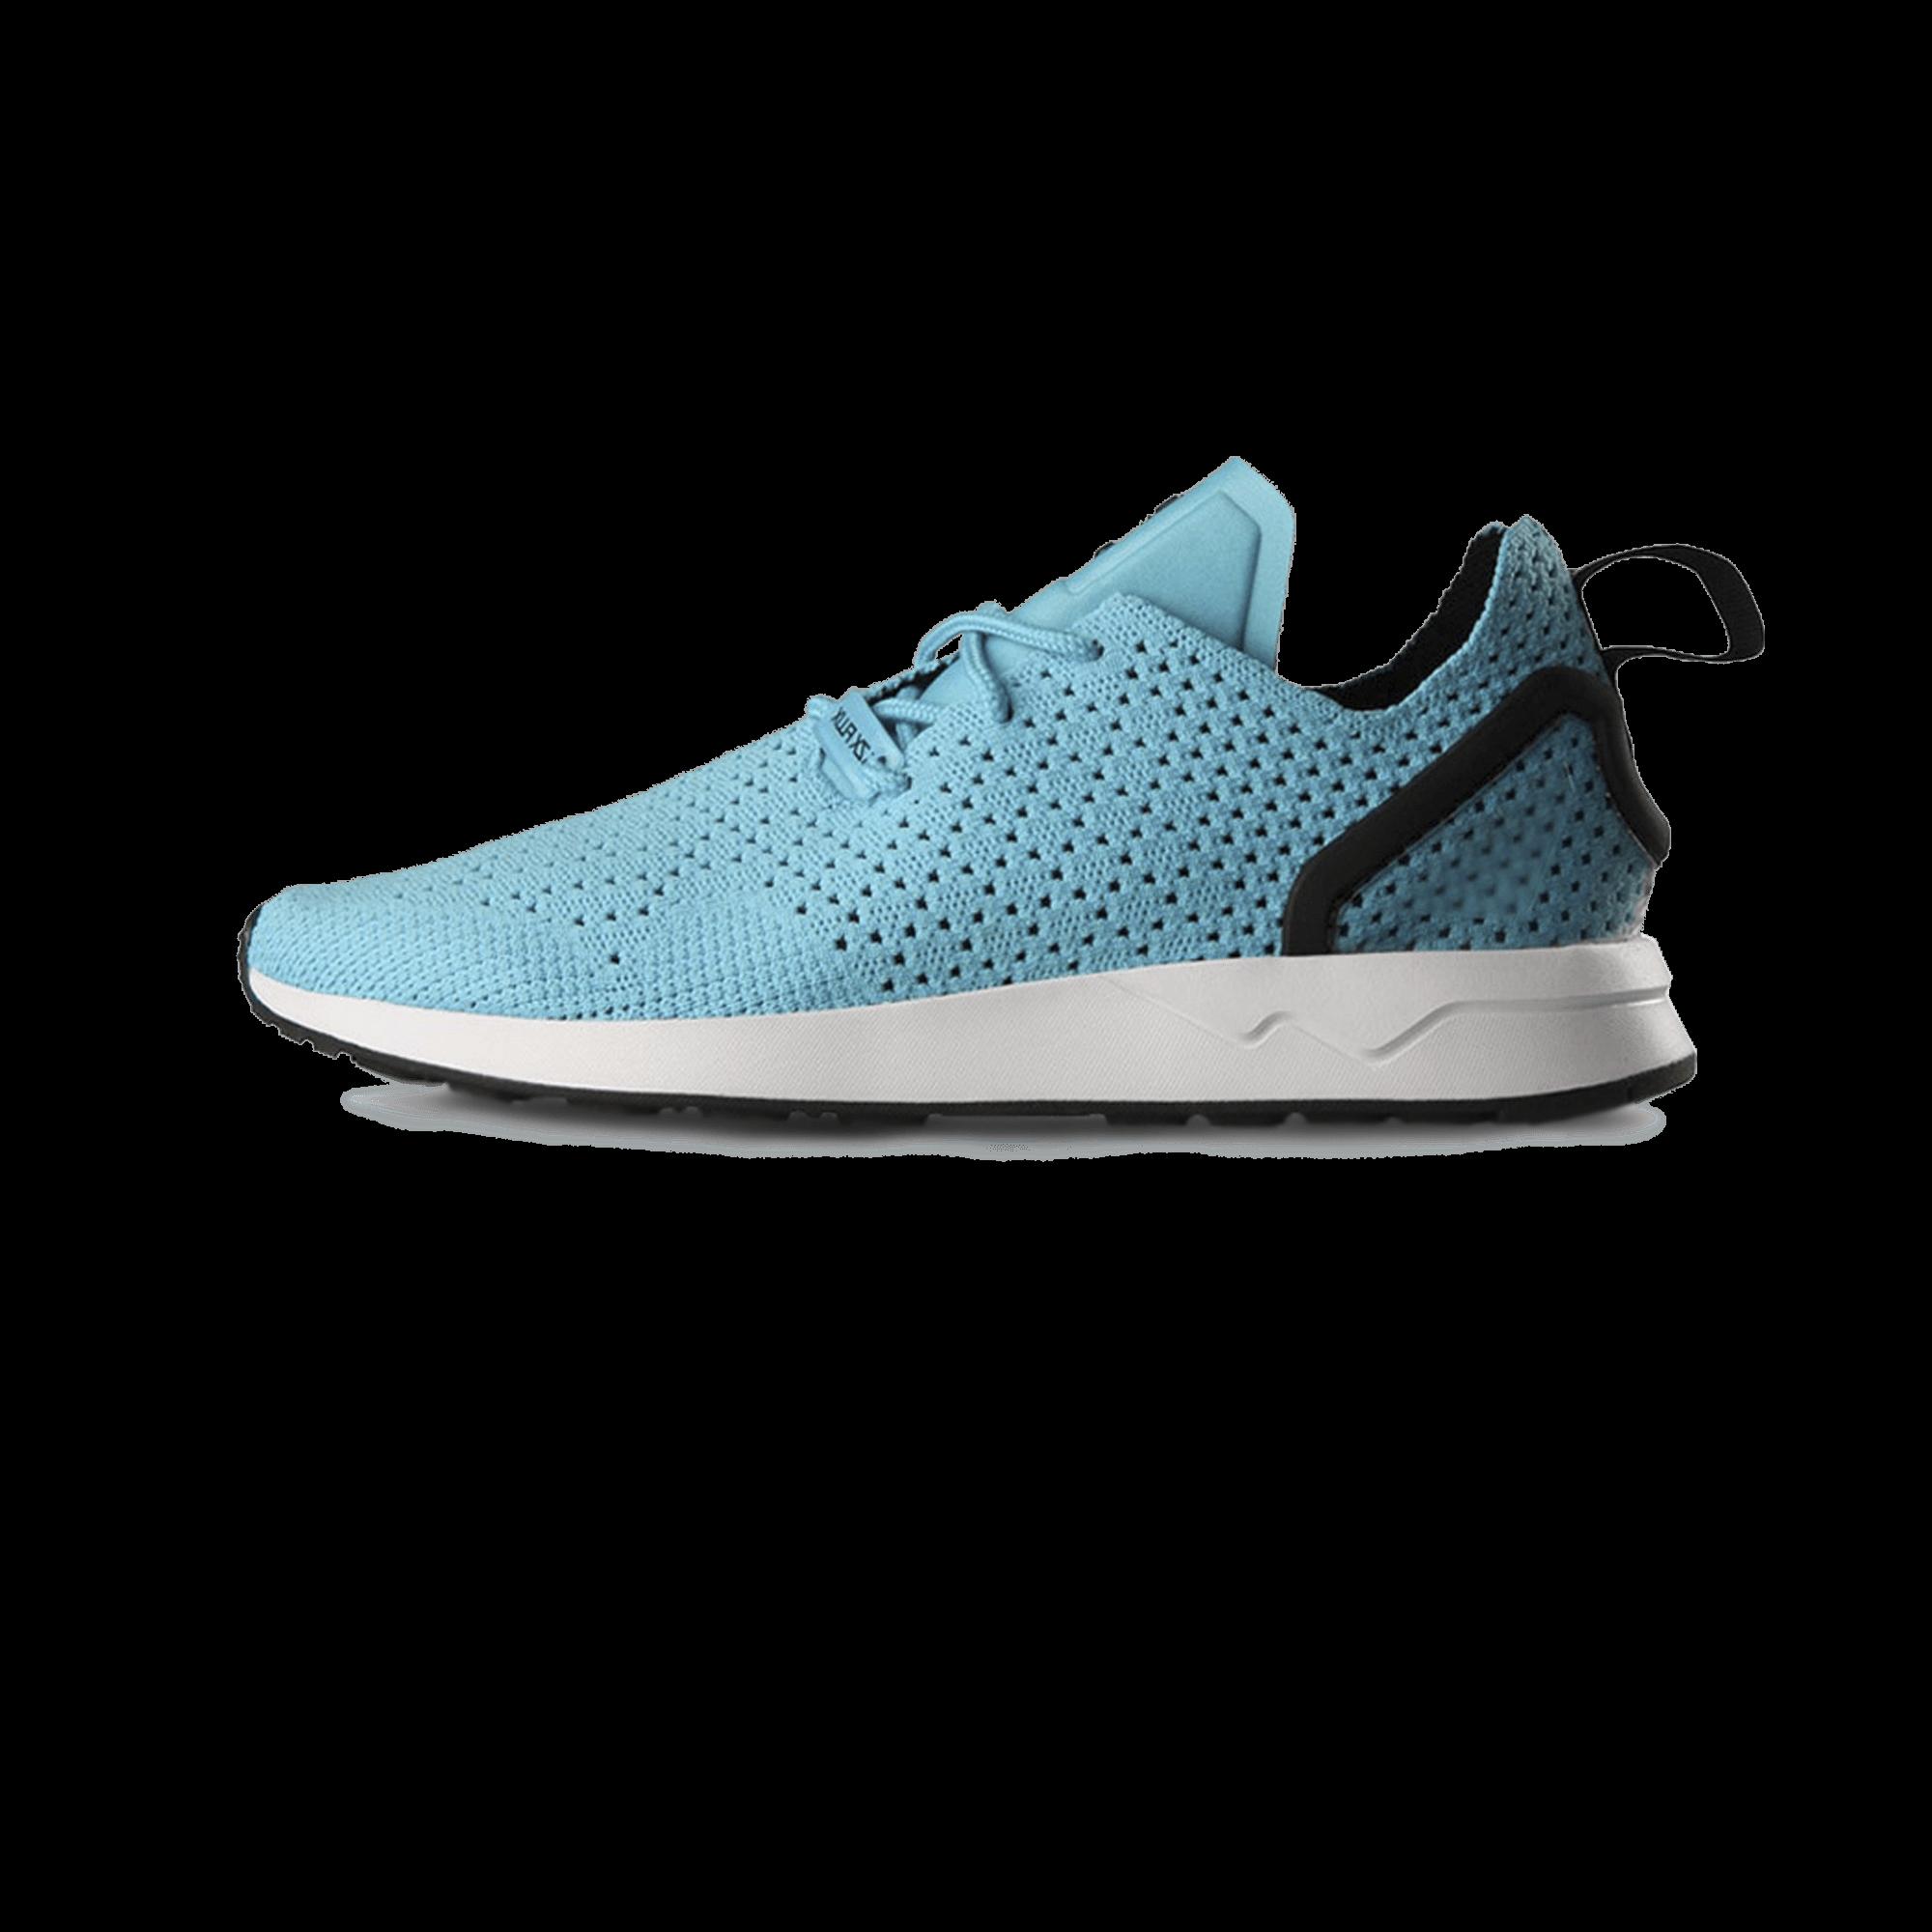 sports shoes f3b34 138a3 adidas ZX Flux ADV Asymmetrical Primeknit blue - Men | Holypopstore.com